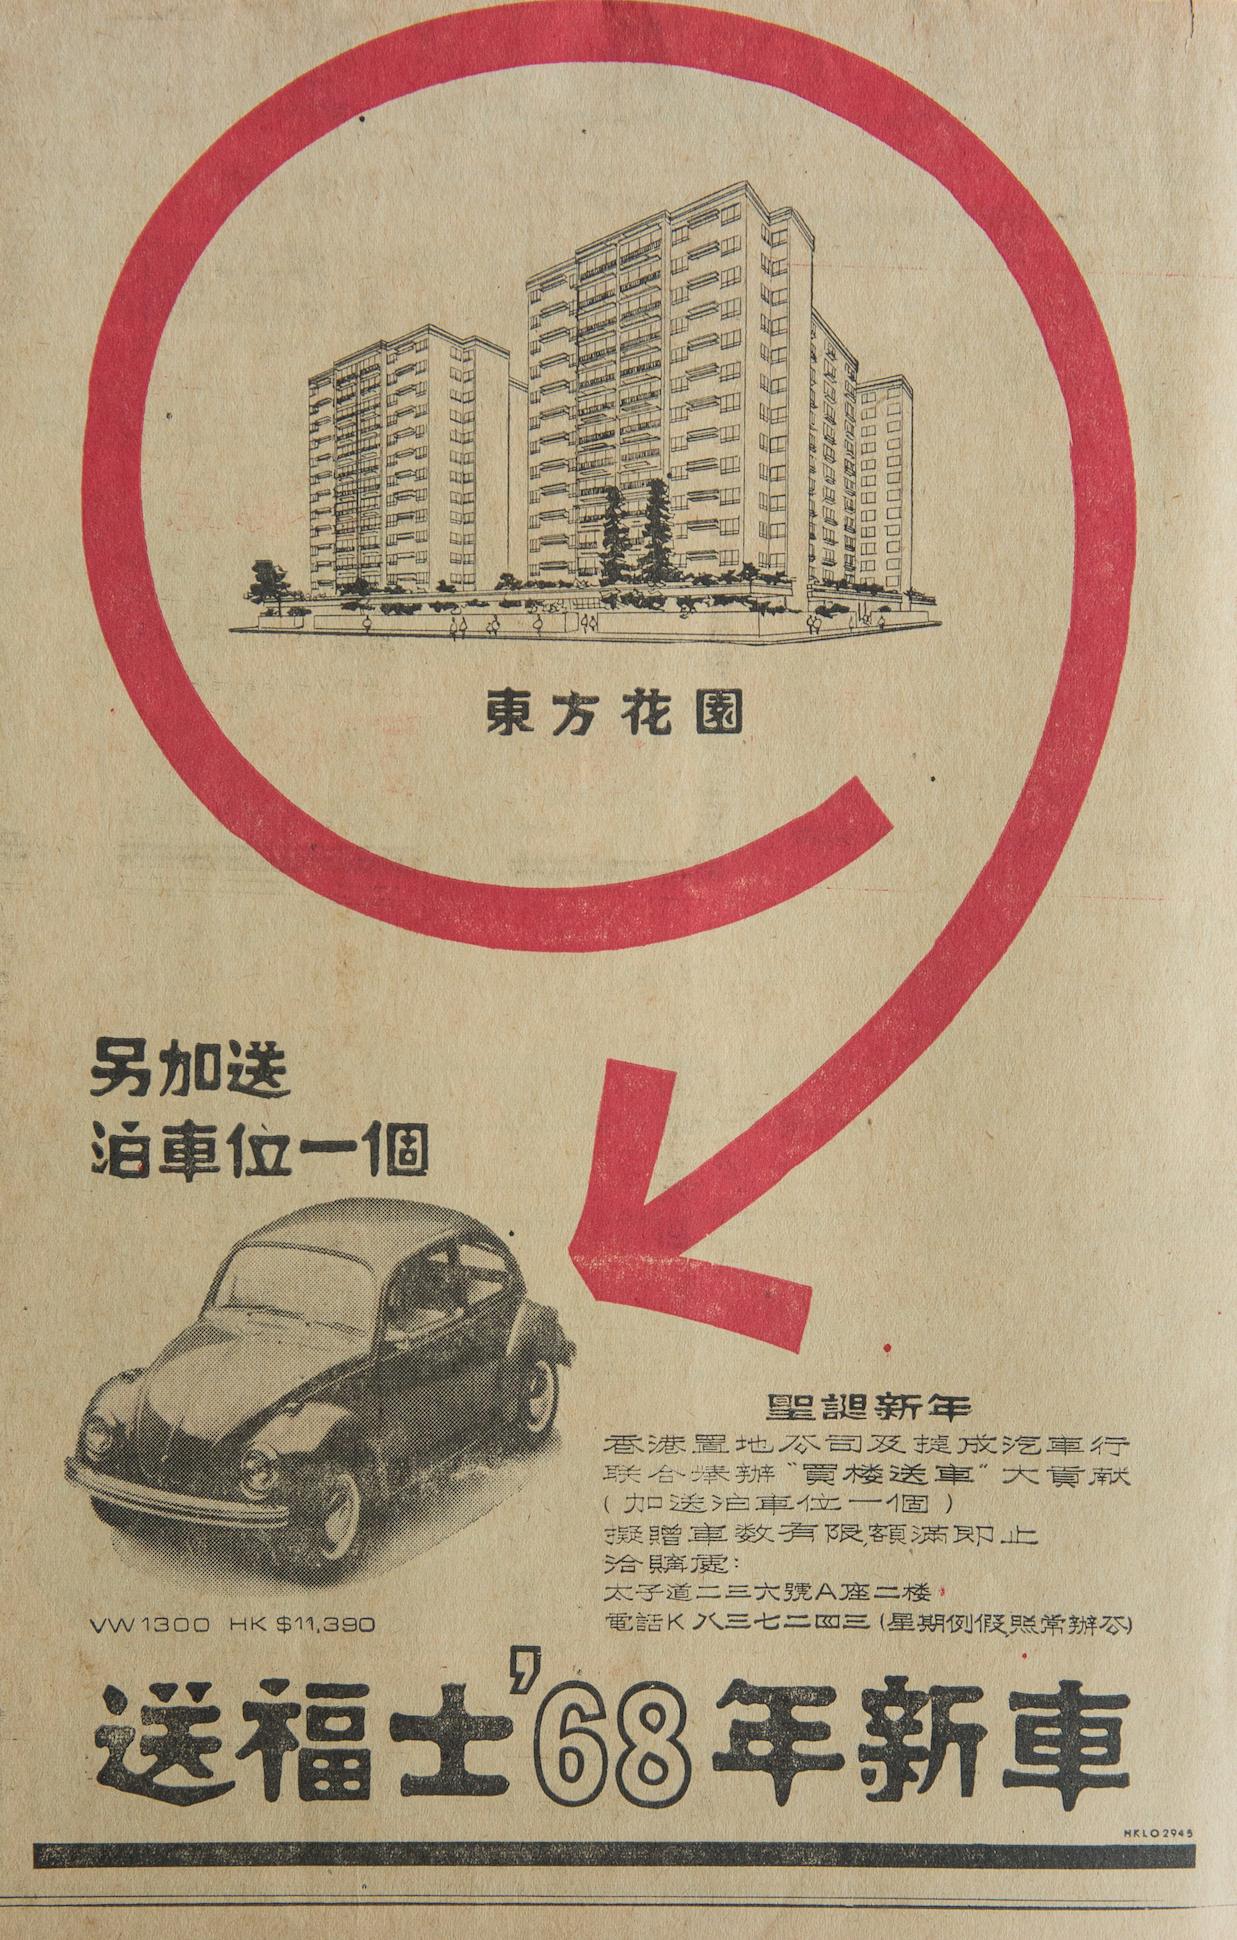 2604-vintage-car-02-002